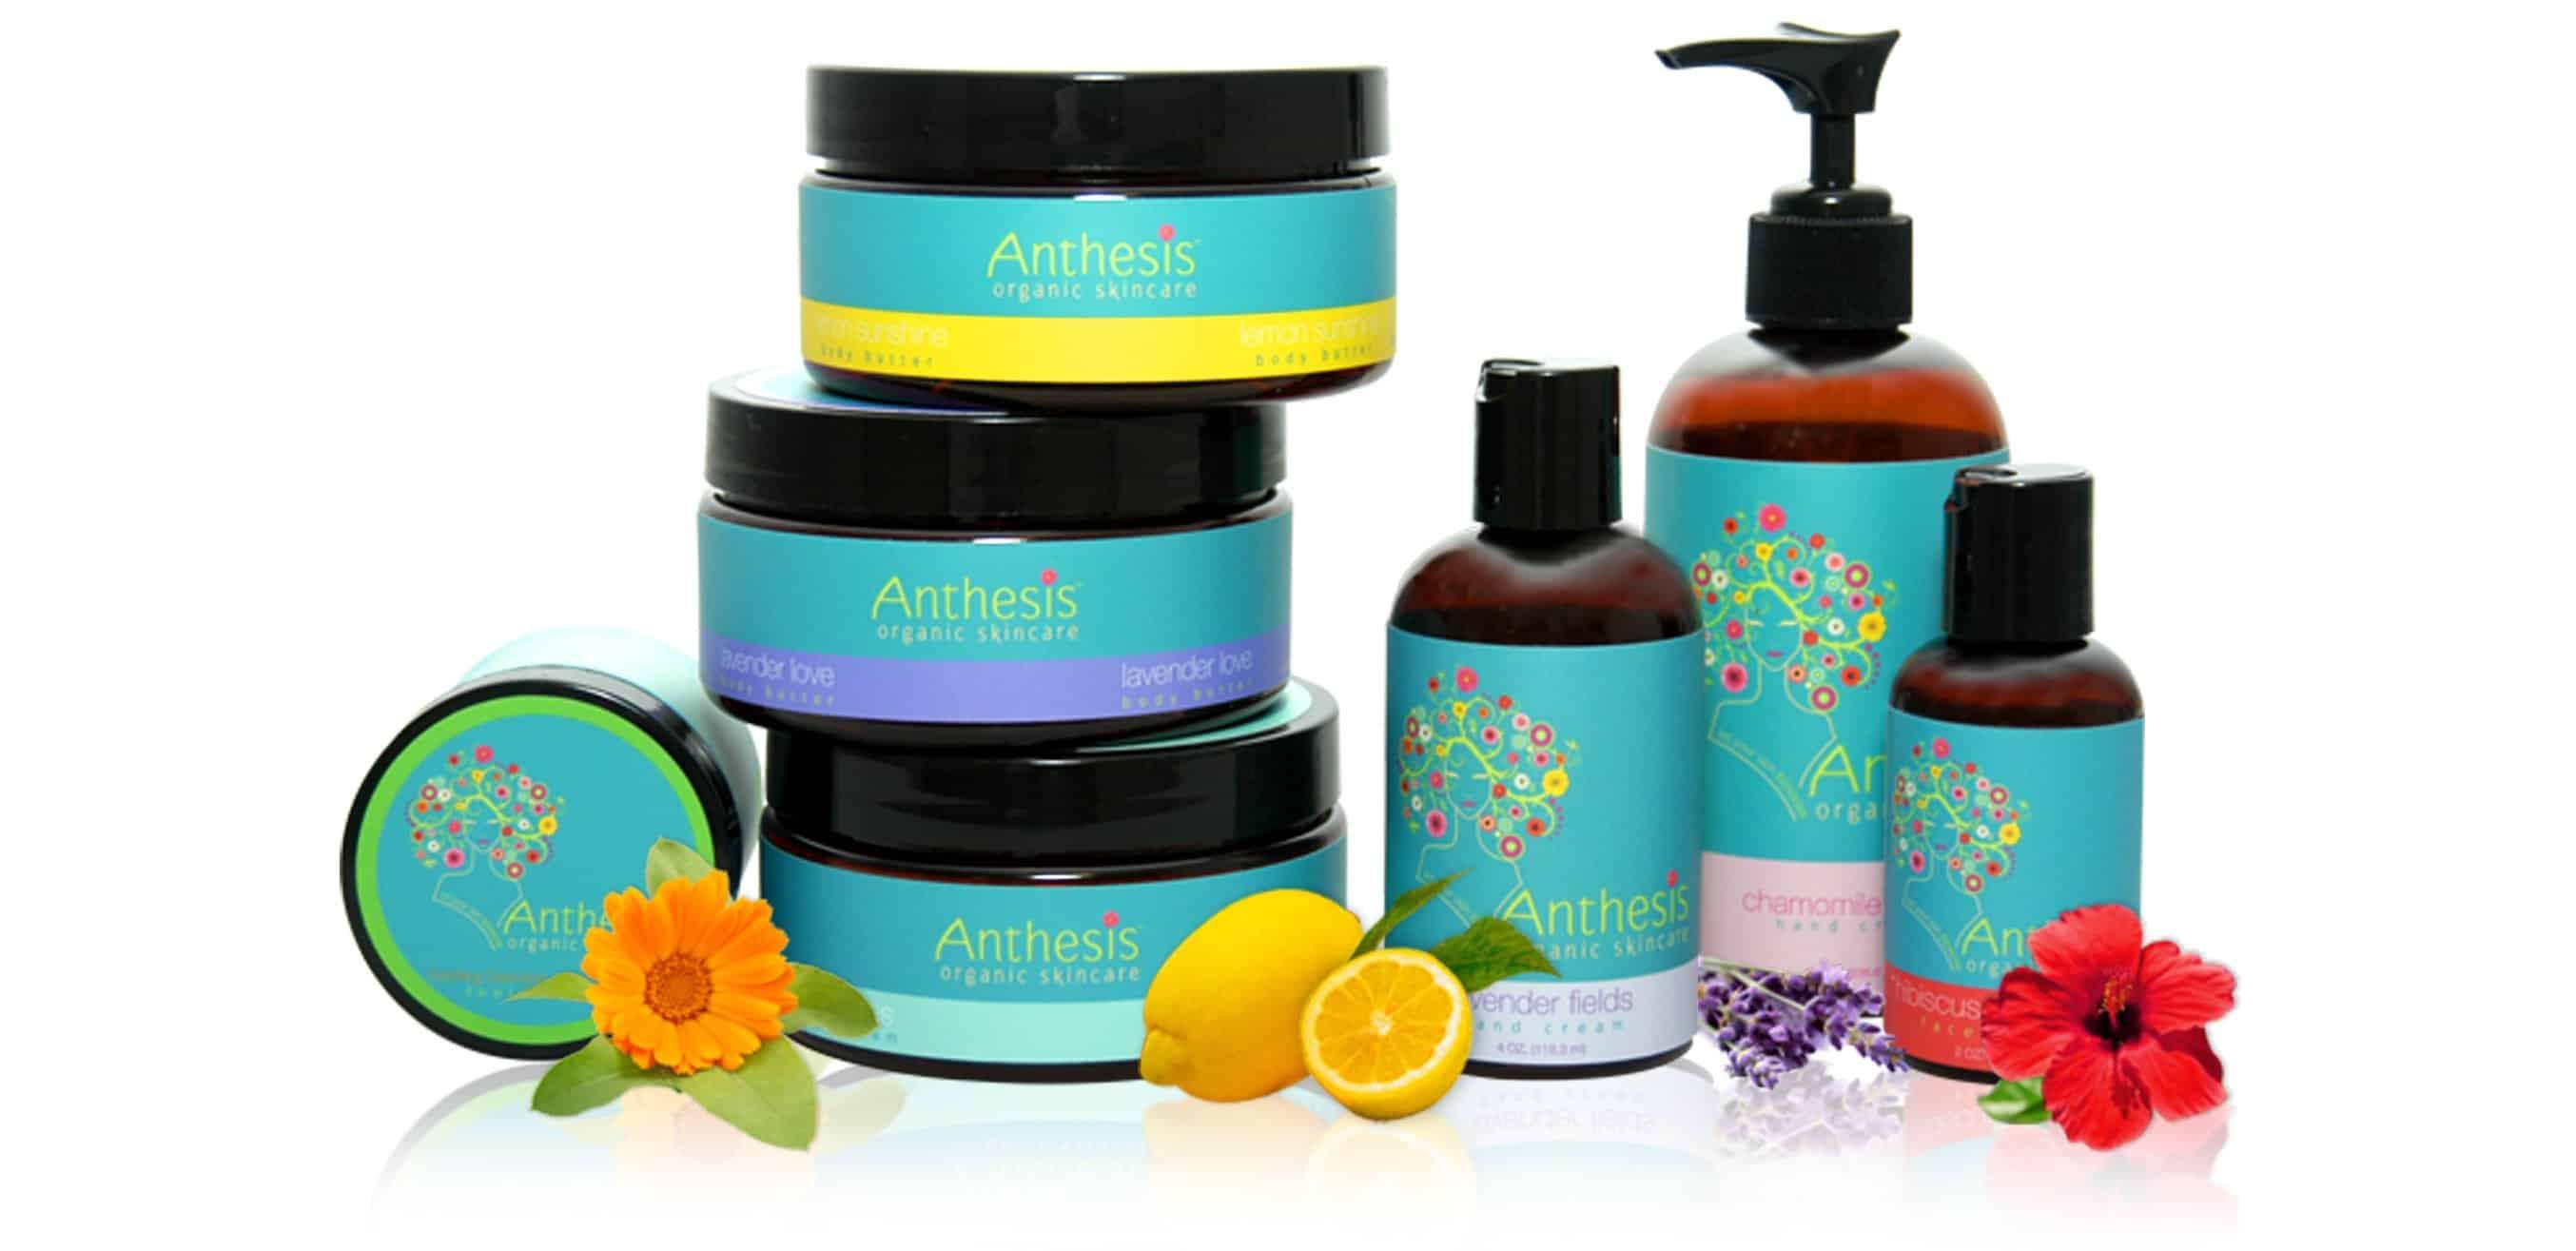 Anthesis_Packaging